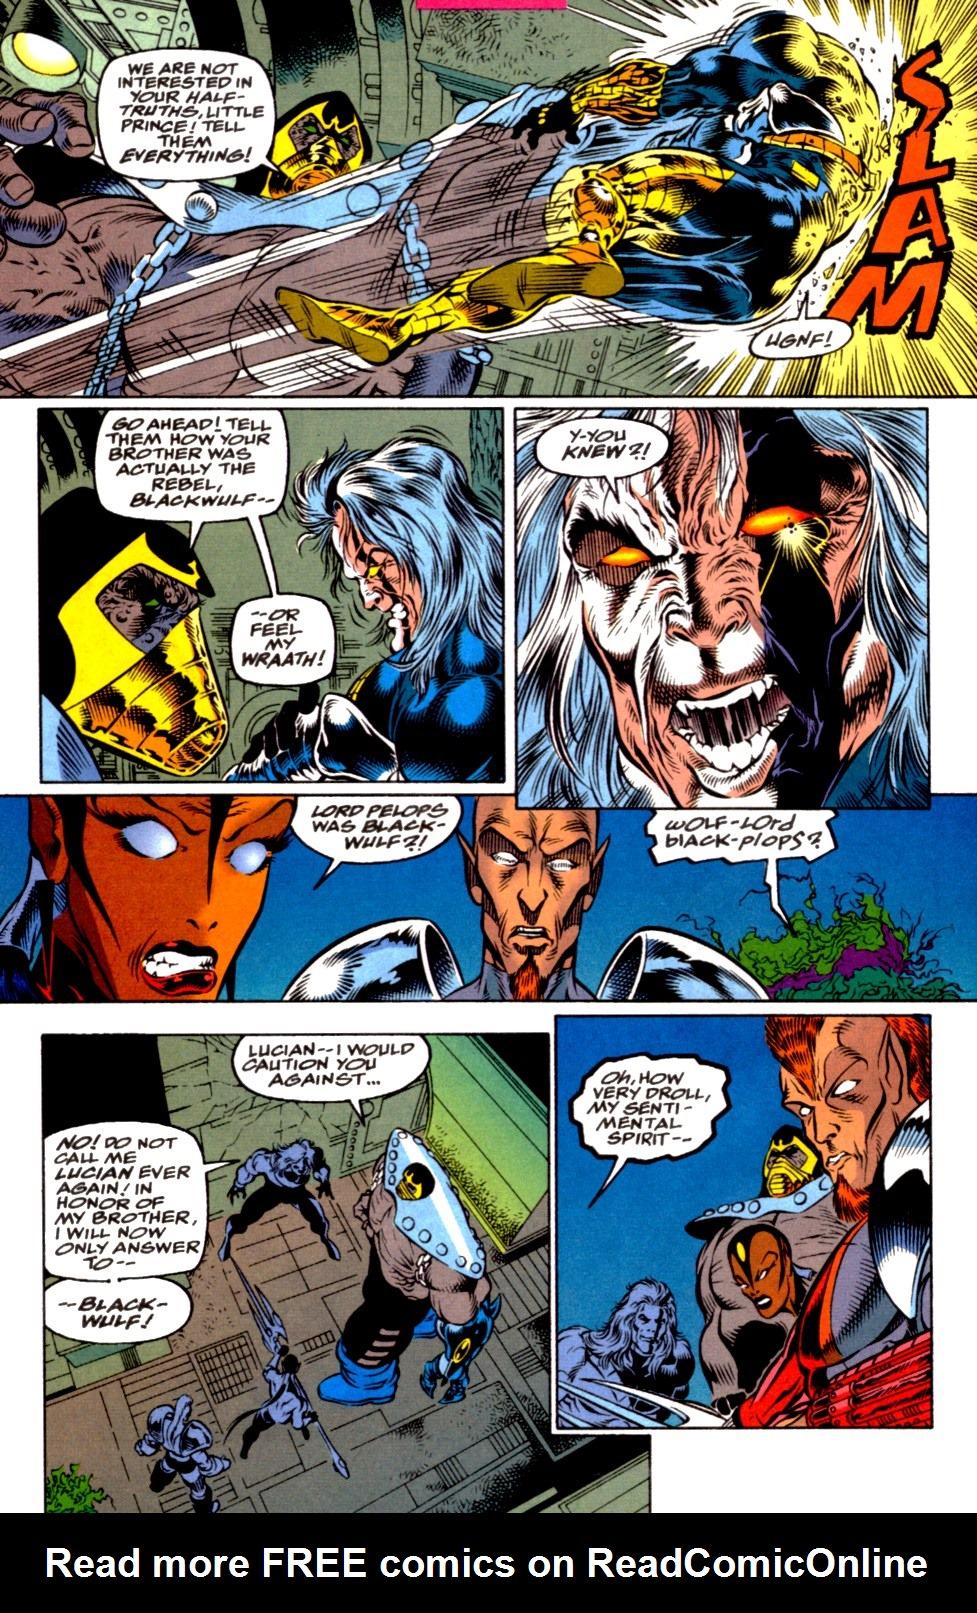 Read online Blackwulf comic -  Issue #2 - 5